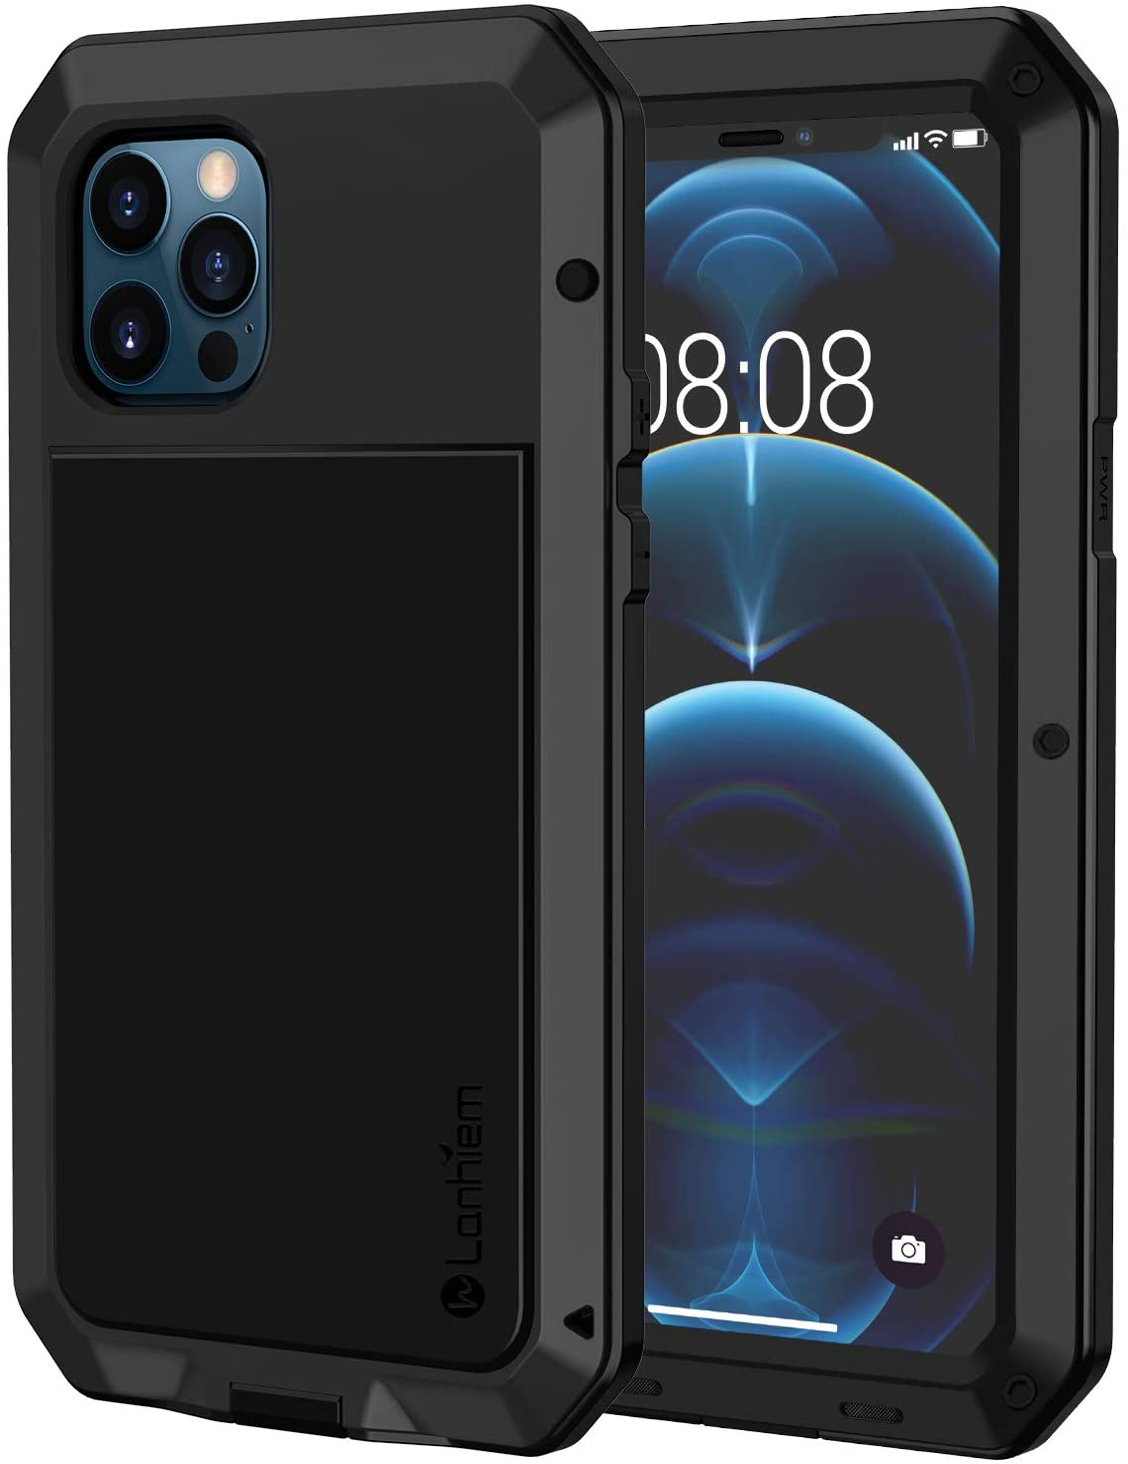 Lanhiem Funda iPhone 12, [Rugged Armour] Antigolpes Metal Estuche Protectora, Absorción de Choque y Duradera Fundas con Protector de Pantalla Vidrio Carcasa para iPhone 12 Pro, Negro